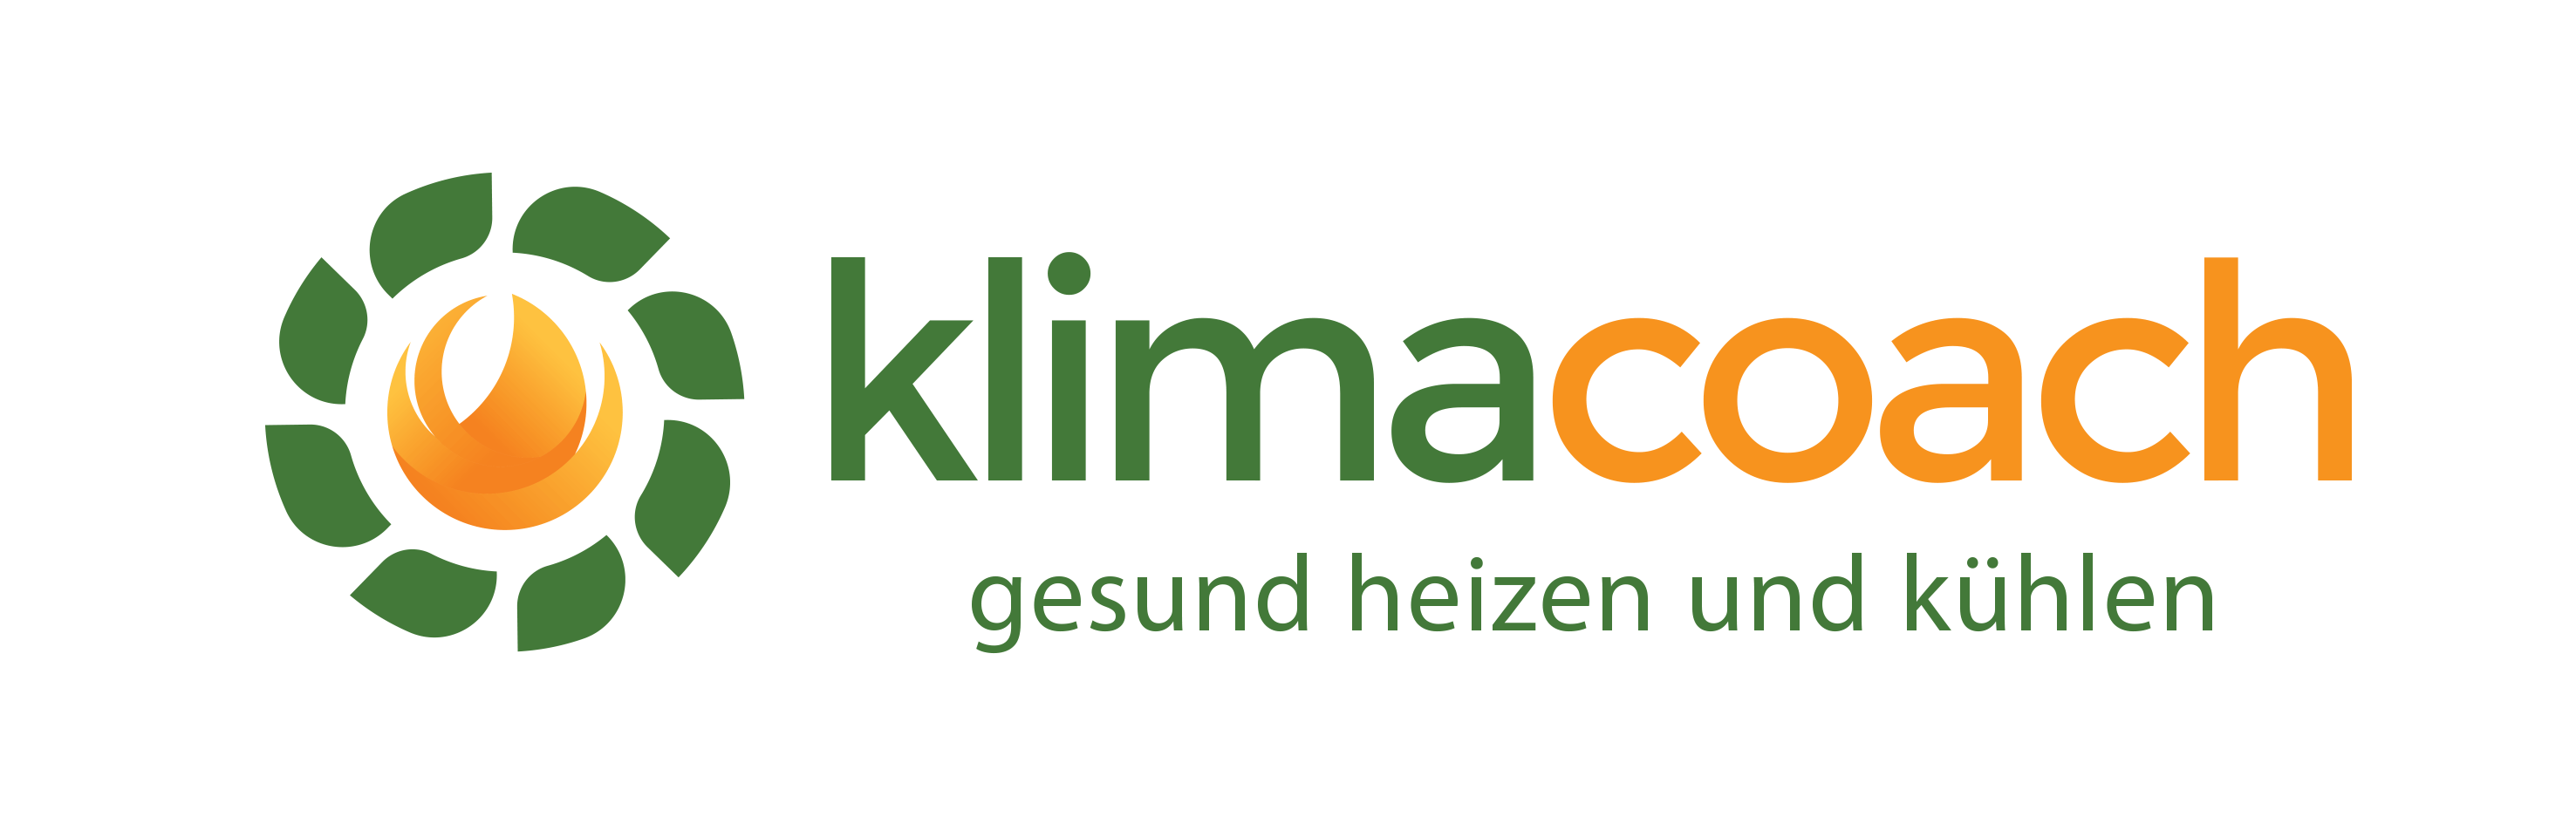 Klimacoach logo